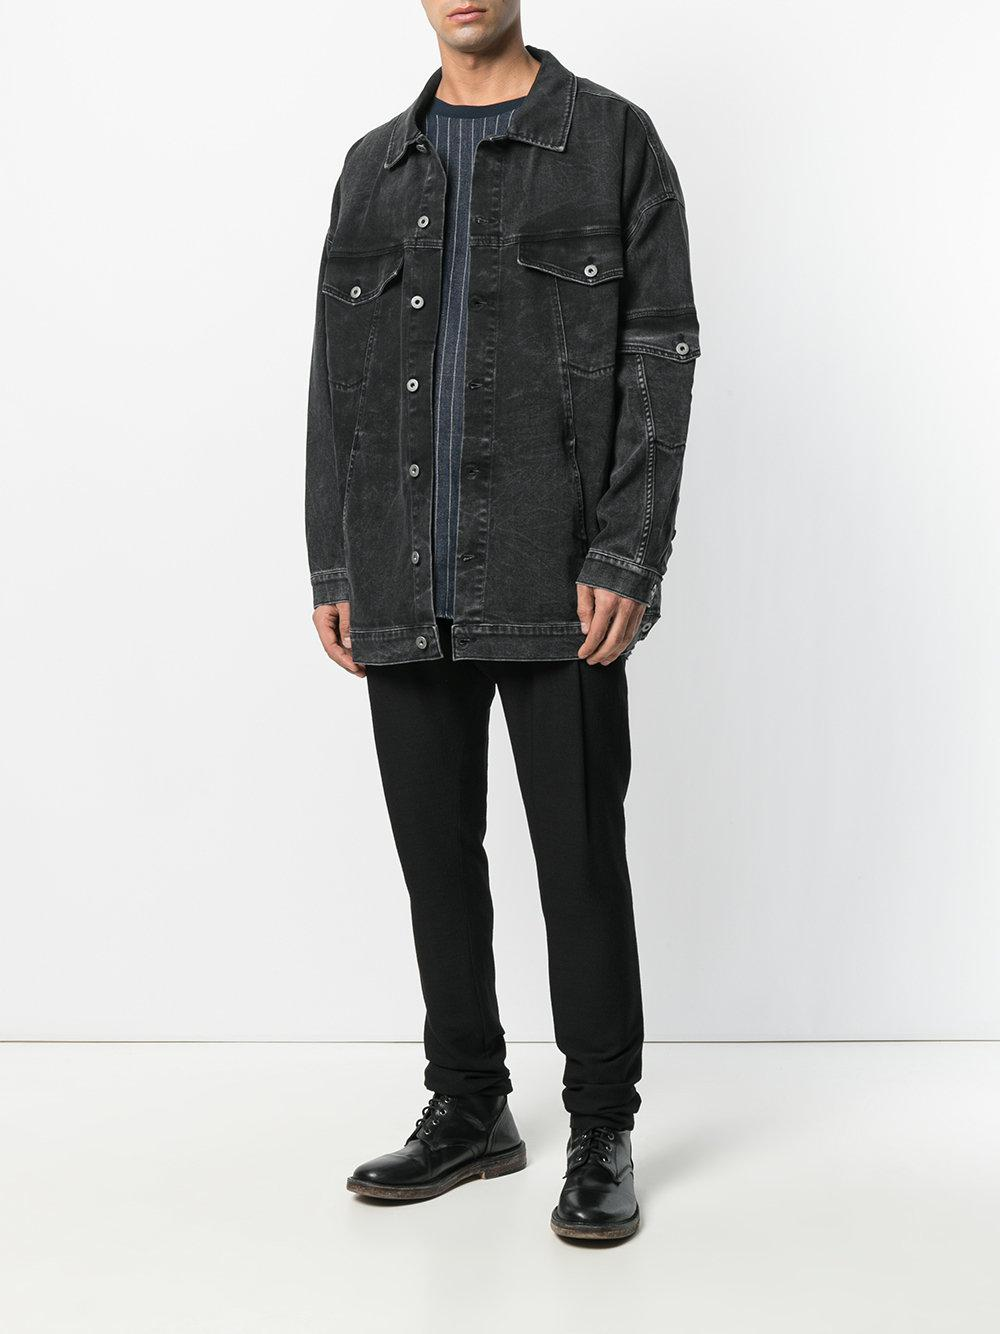 Barbara I Gongini Long-line Denim Jacket in Black for Men